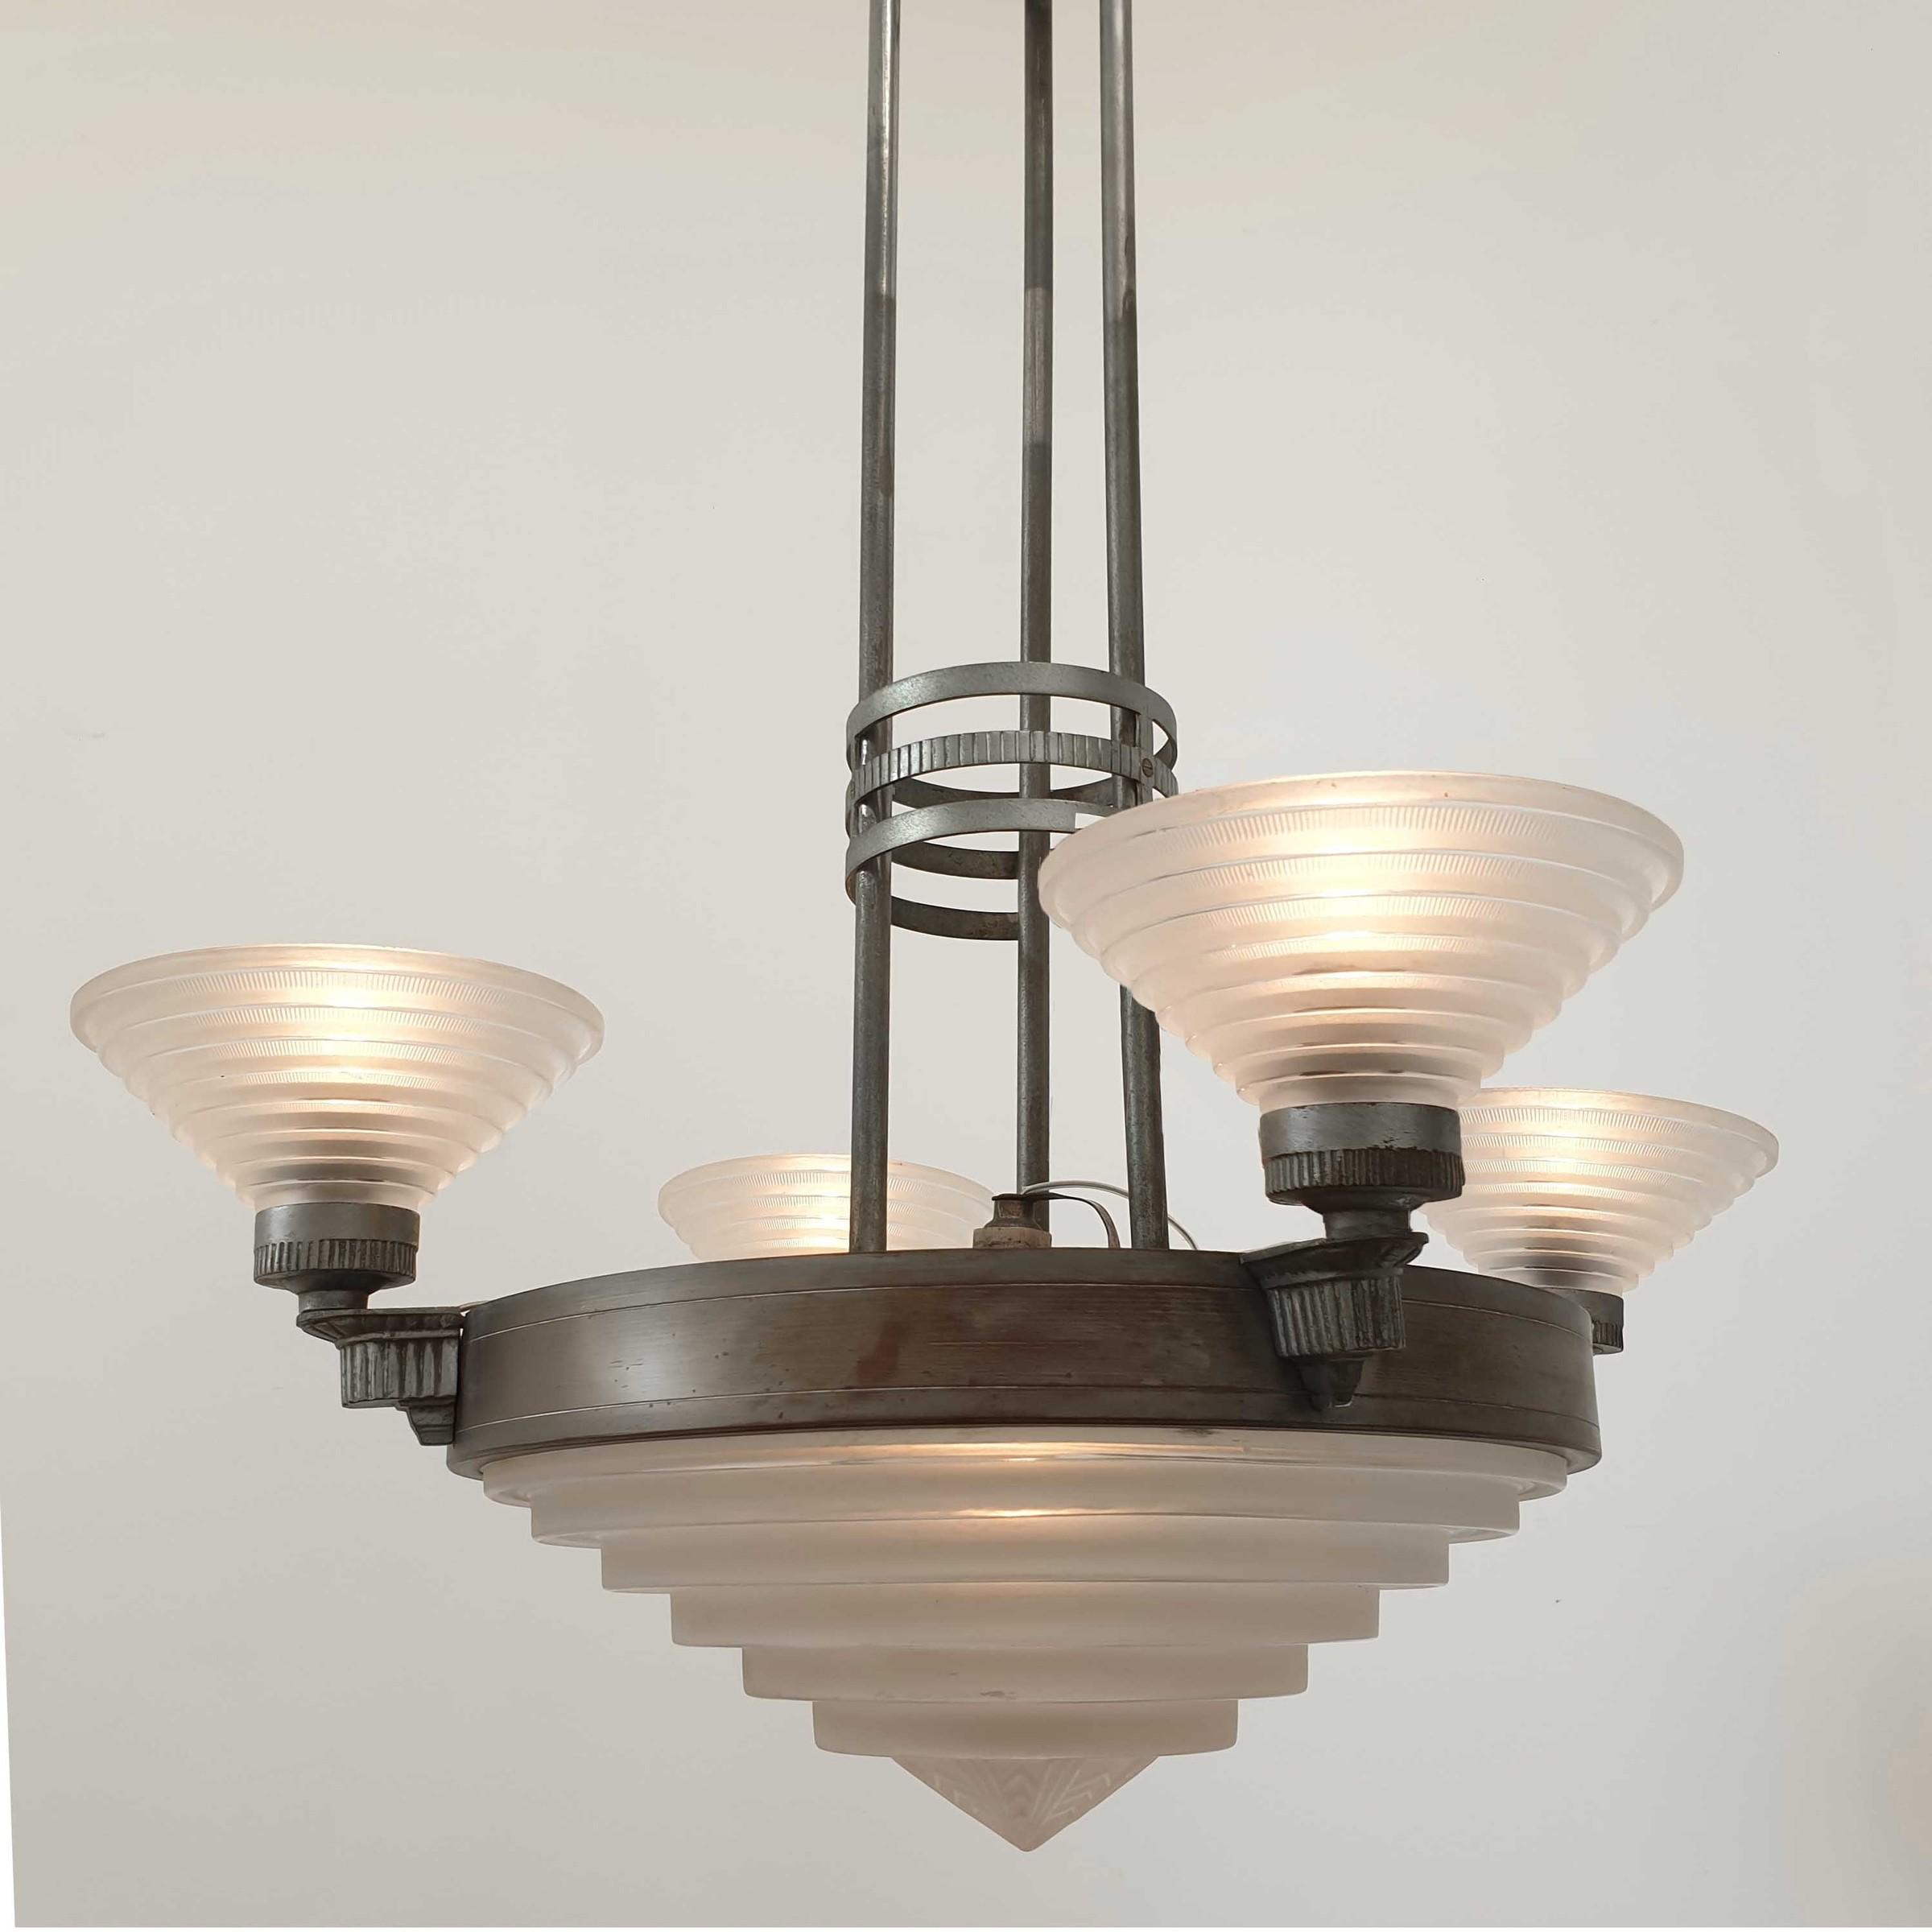 Art deco hanglamp